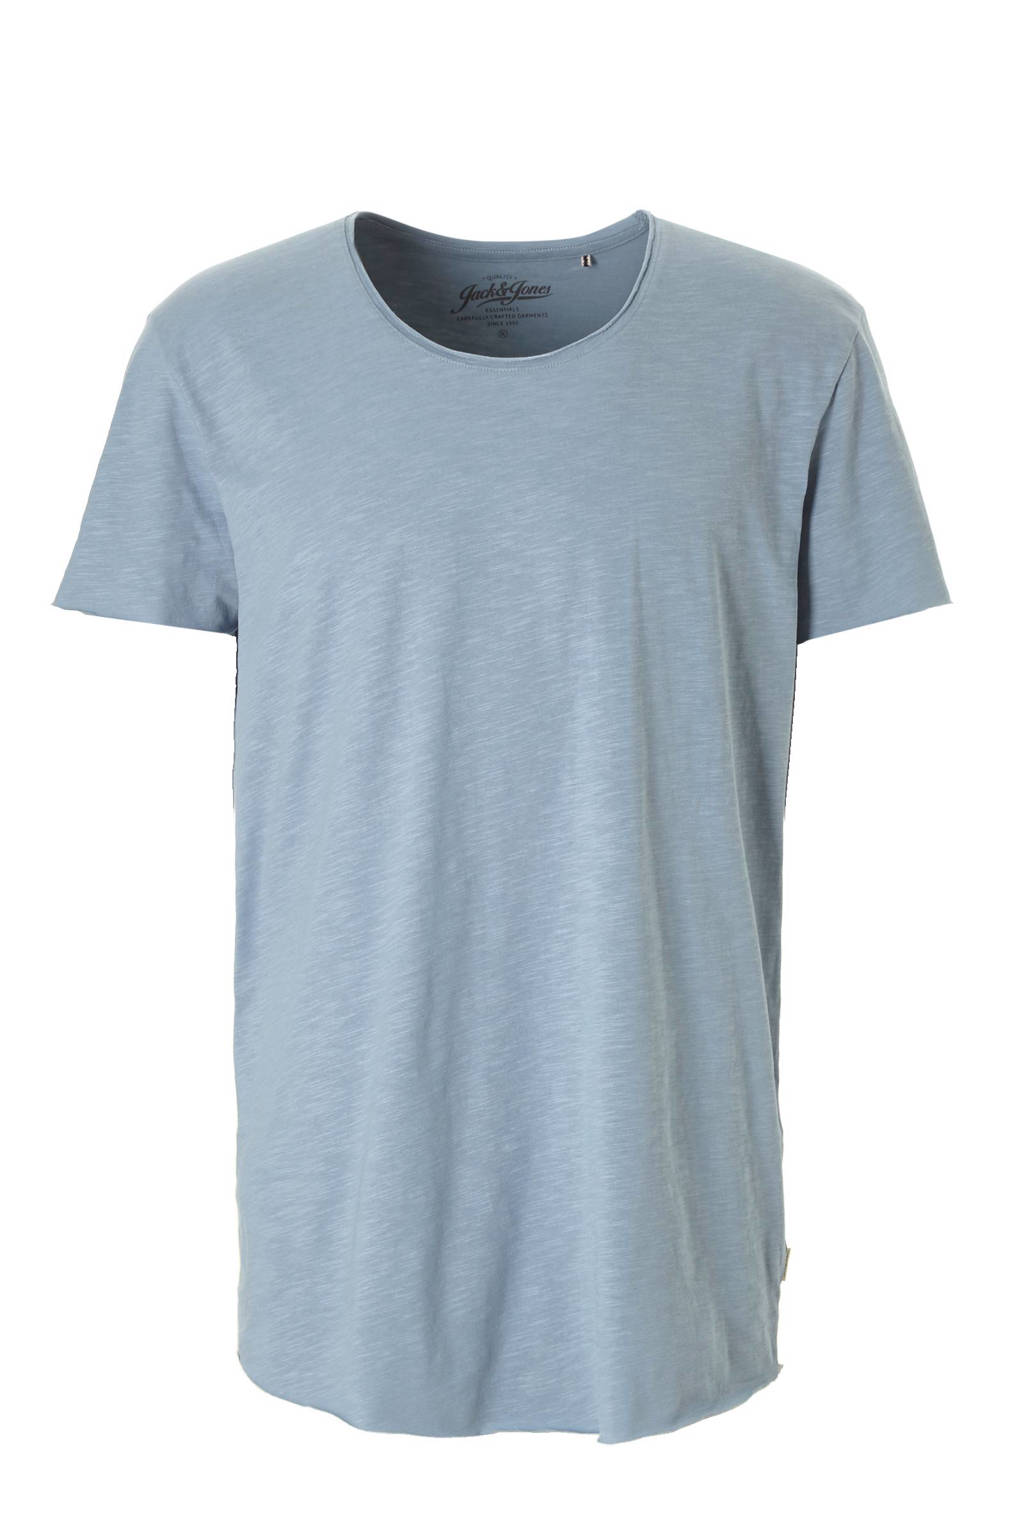 Jack & Jones Essentials T-shirt, Blauw